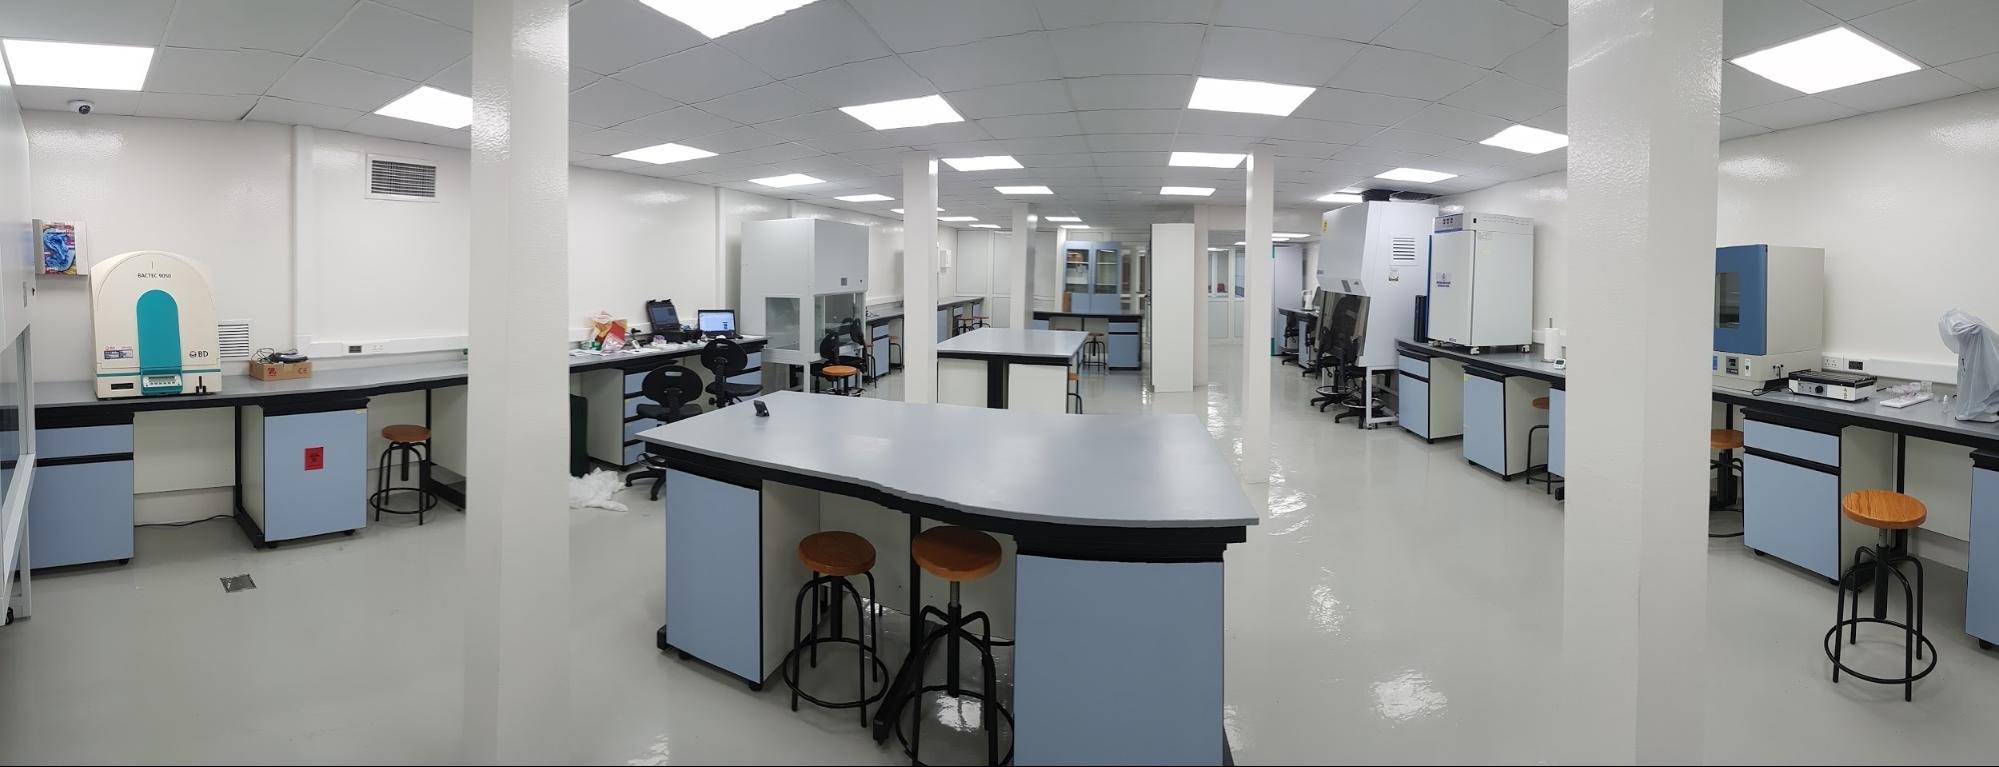 eHealth Africa lab in Kano, Nigeria. (1)